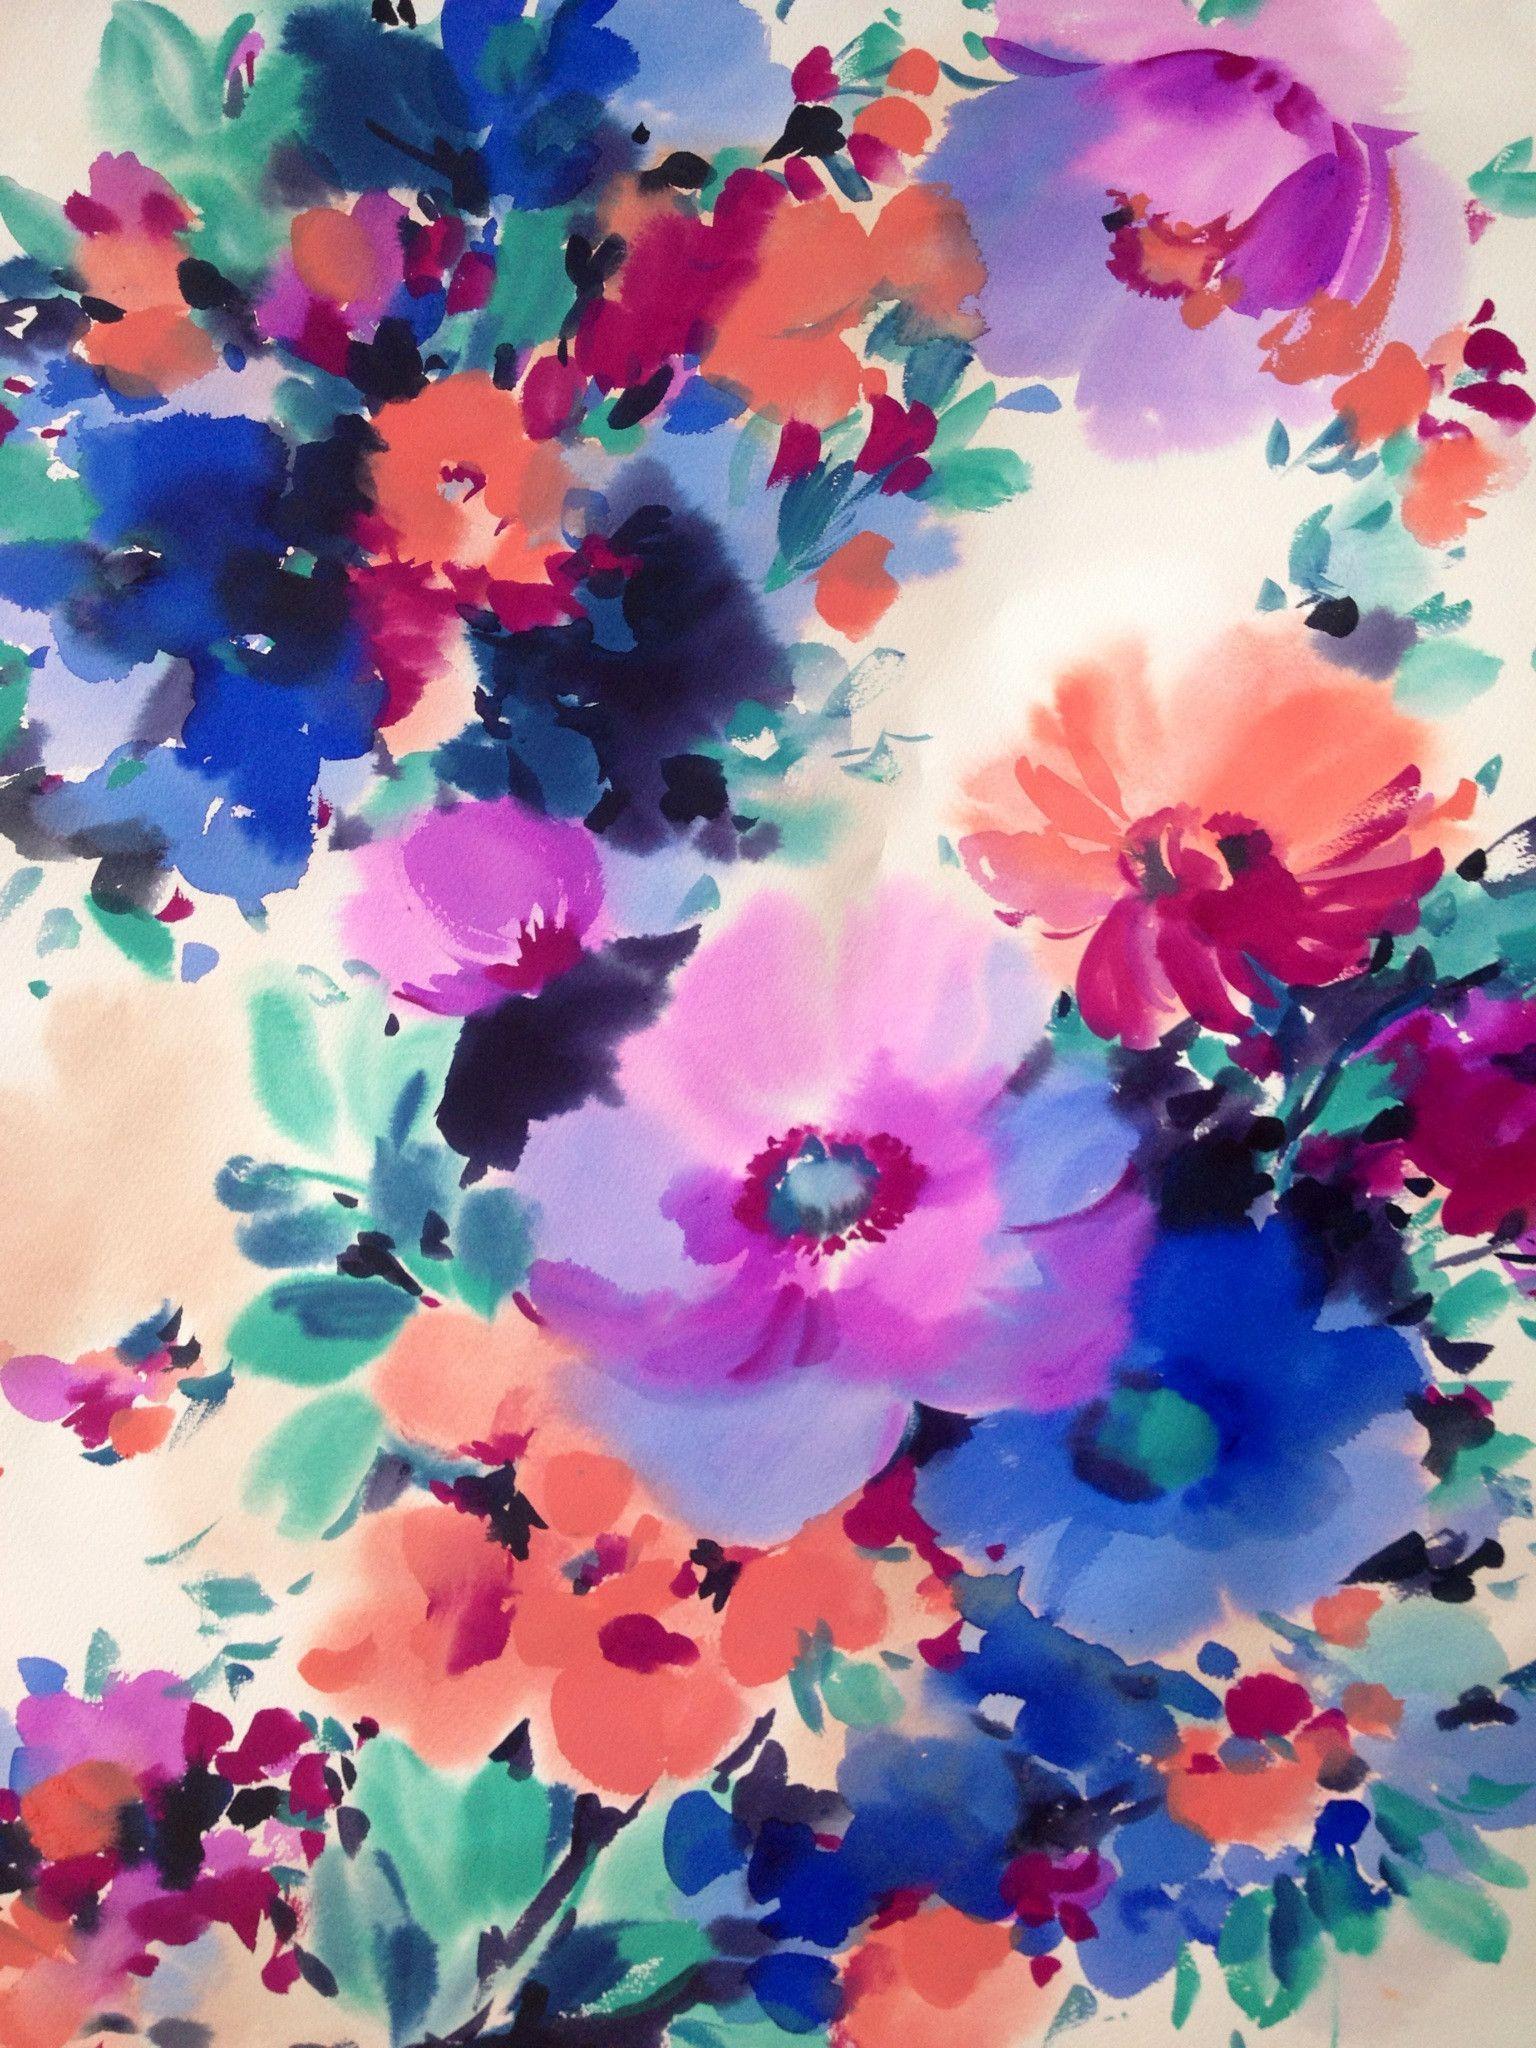 Watercolor Flower Wallpapers Top Free Watercolor Flower